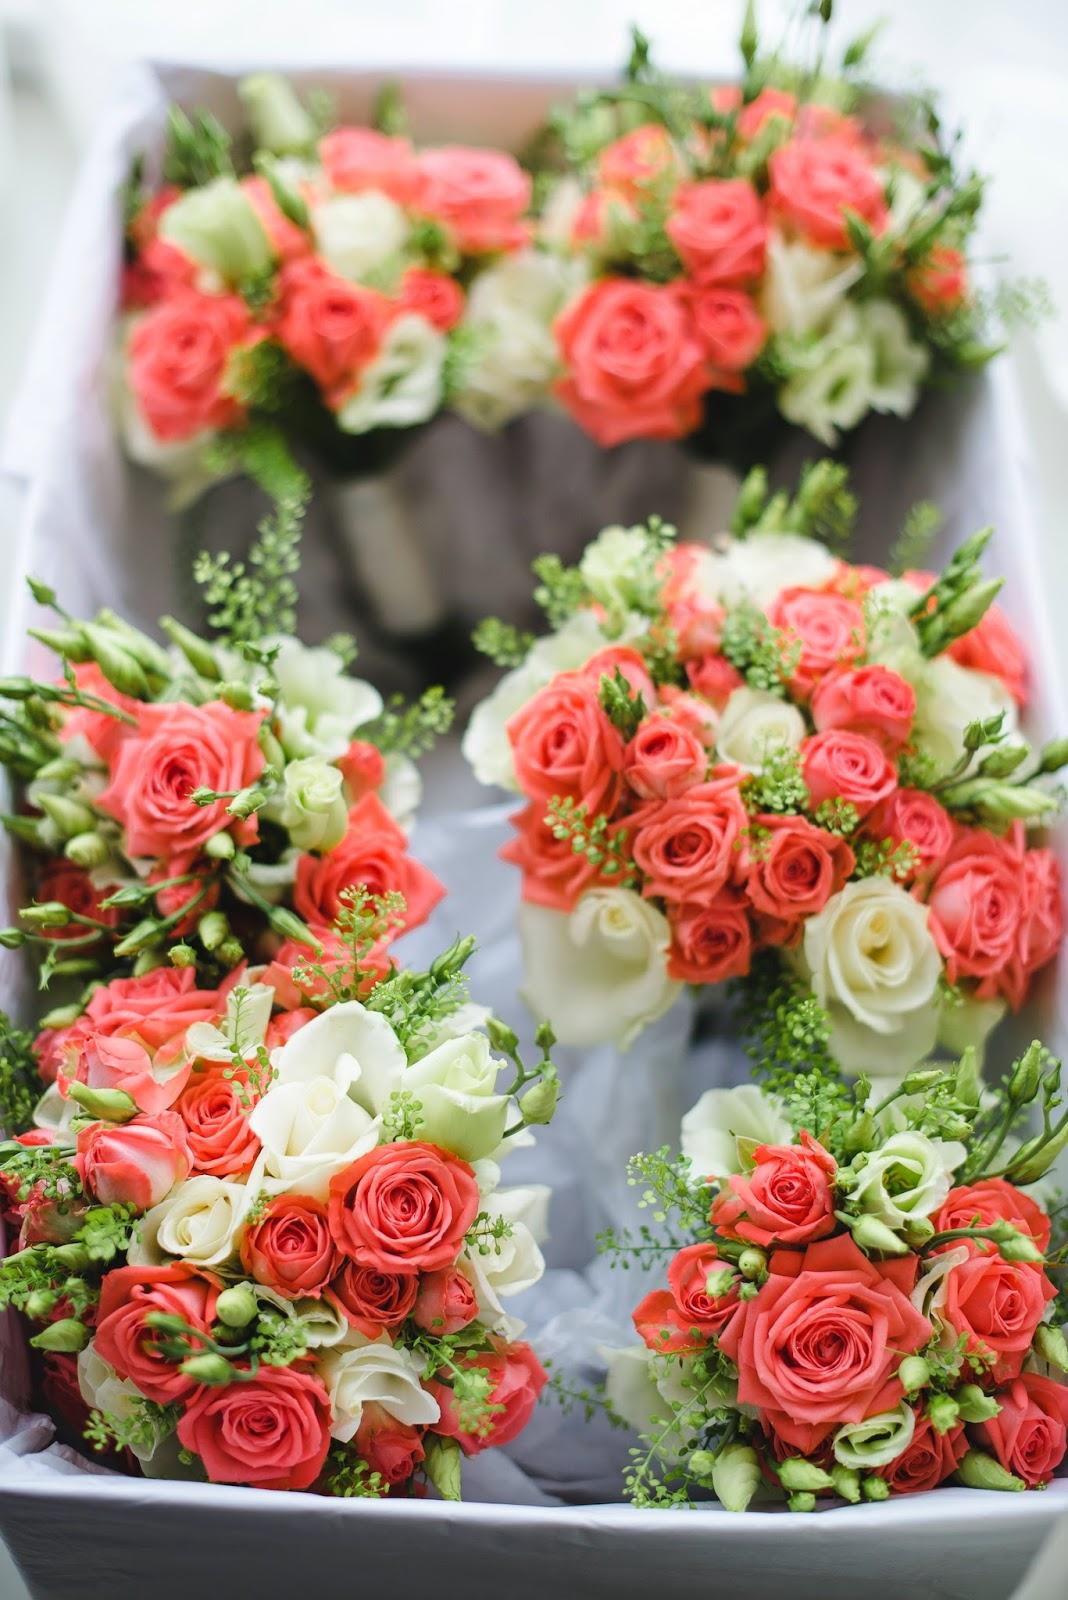 Bridal Wedding Flowers Blenheim Palace Orangery, Joanna Carter Wedding Flowers, Oxford, Oxfordshire, Buckinghamshire, Berkshire and London